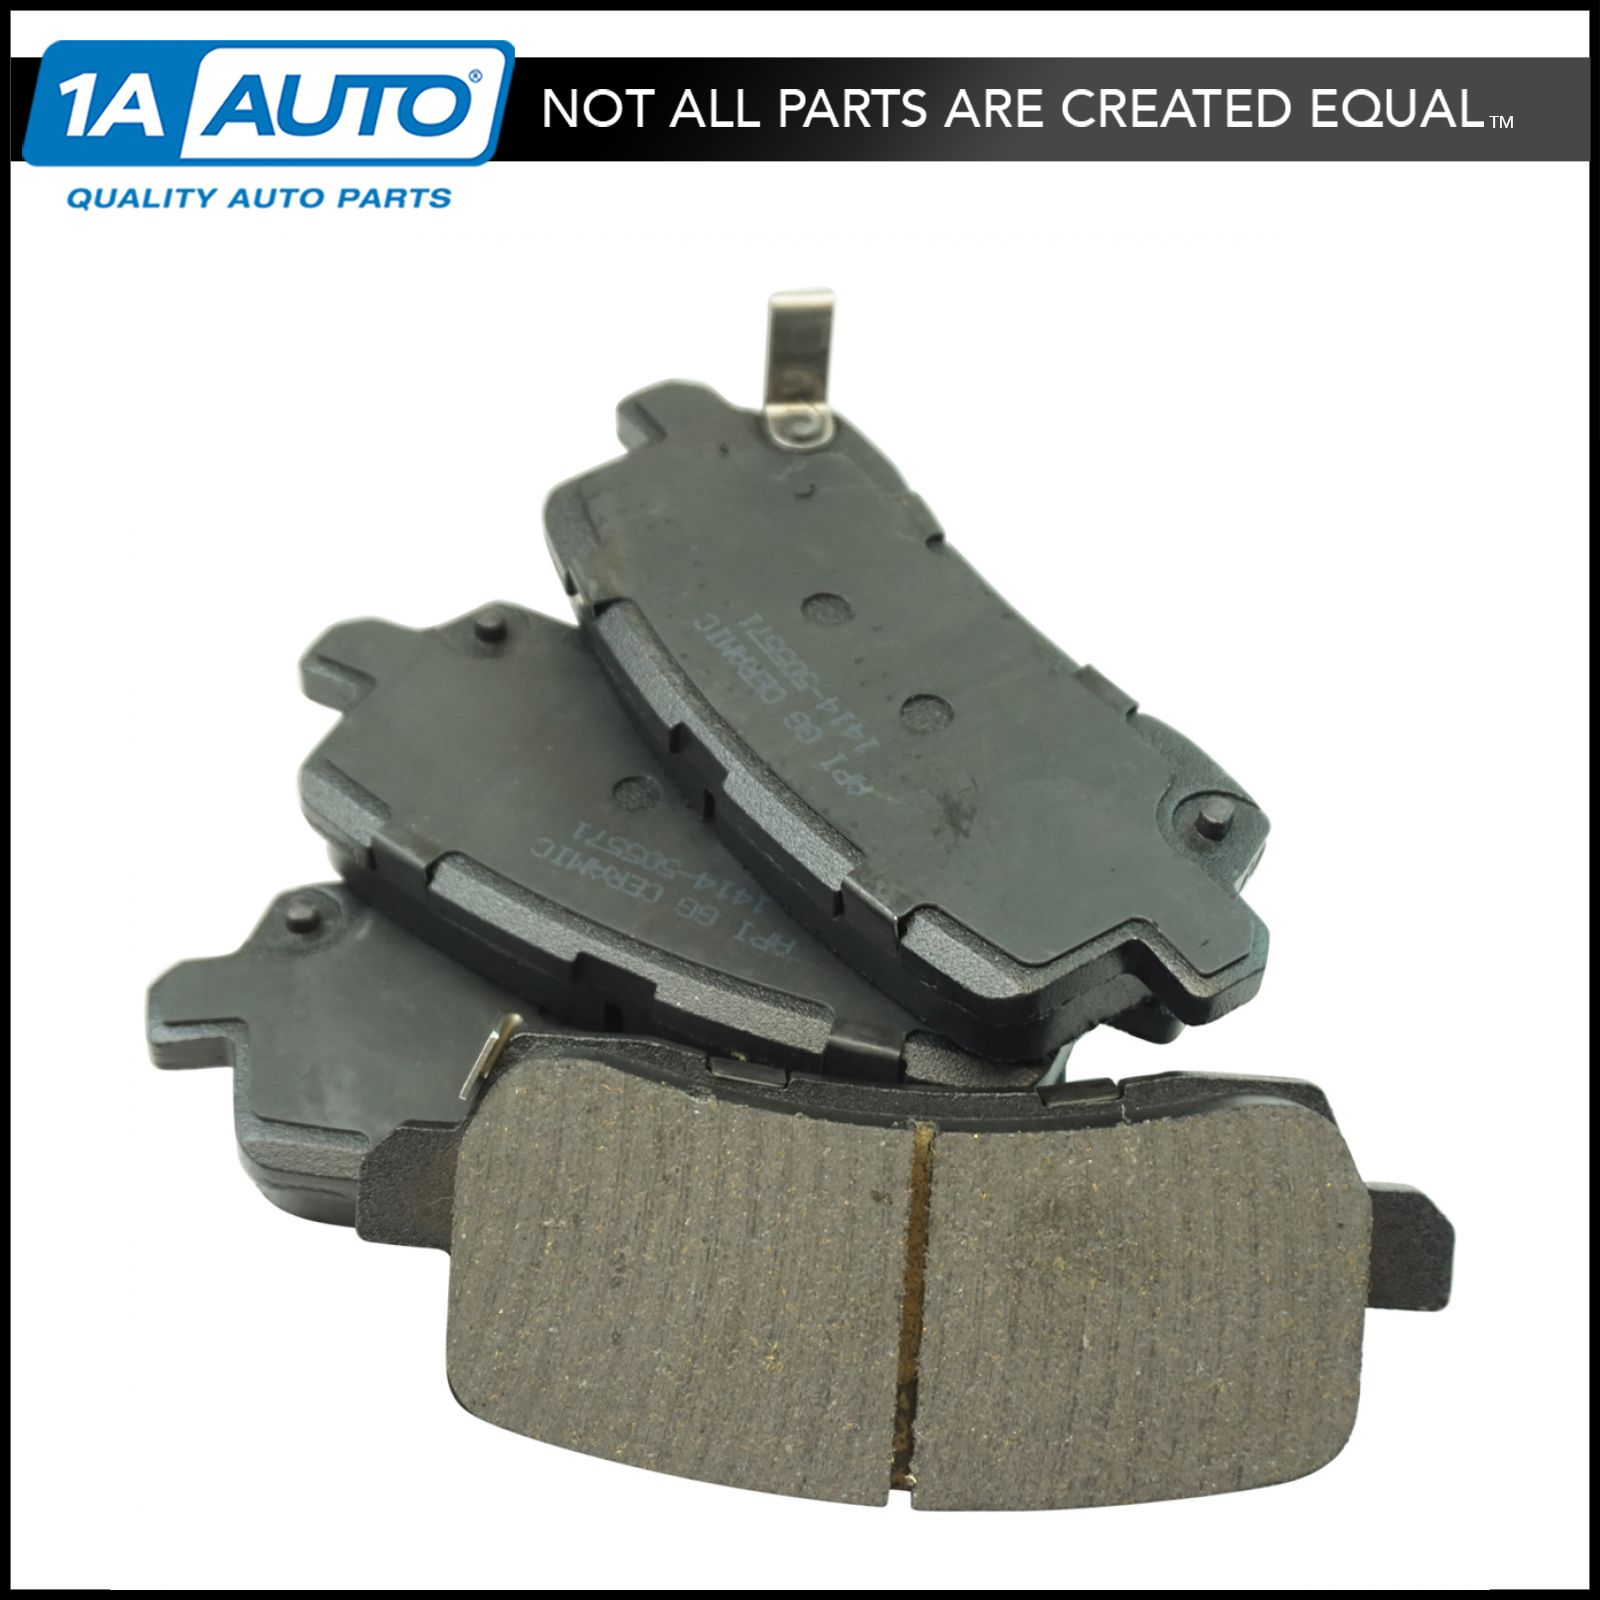 Rear Premium Posi Ceramic Disc Brake Pad Set For Acura RLX